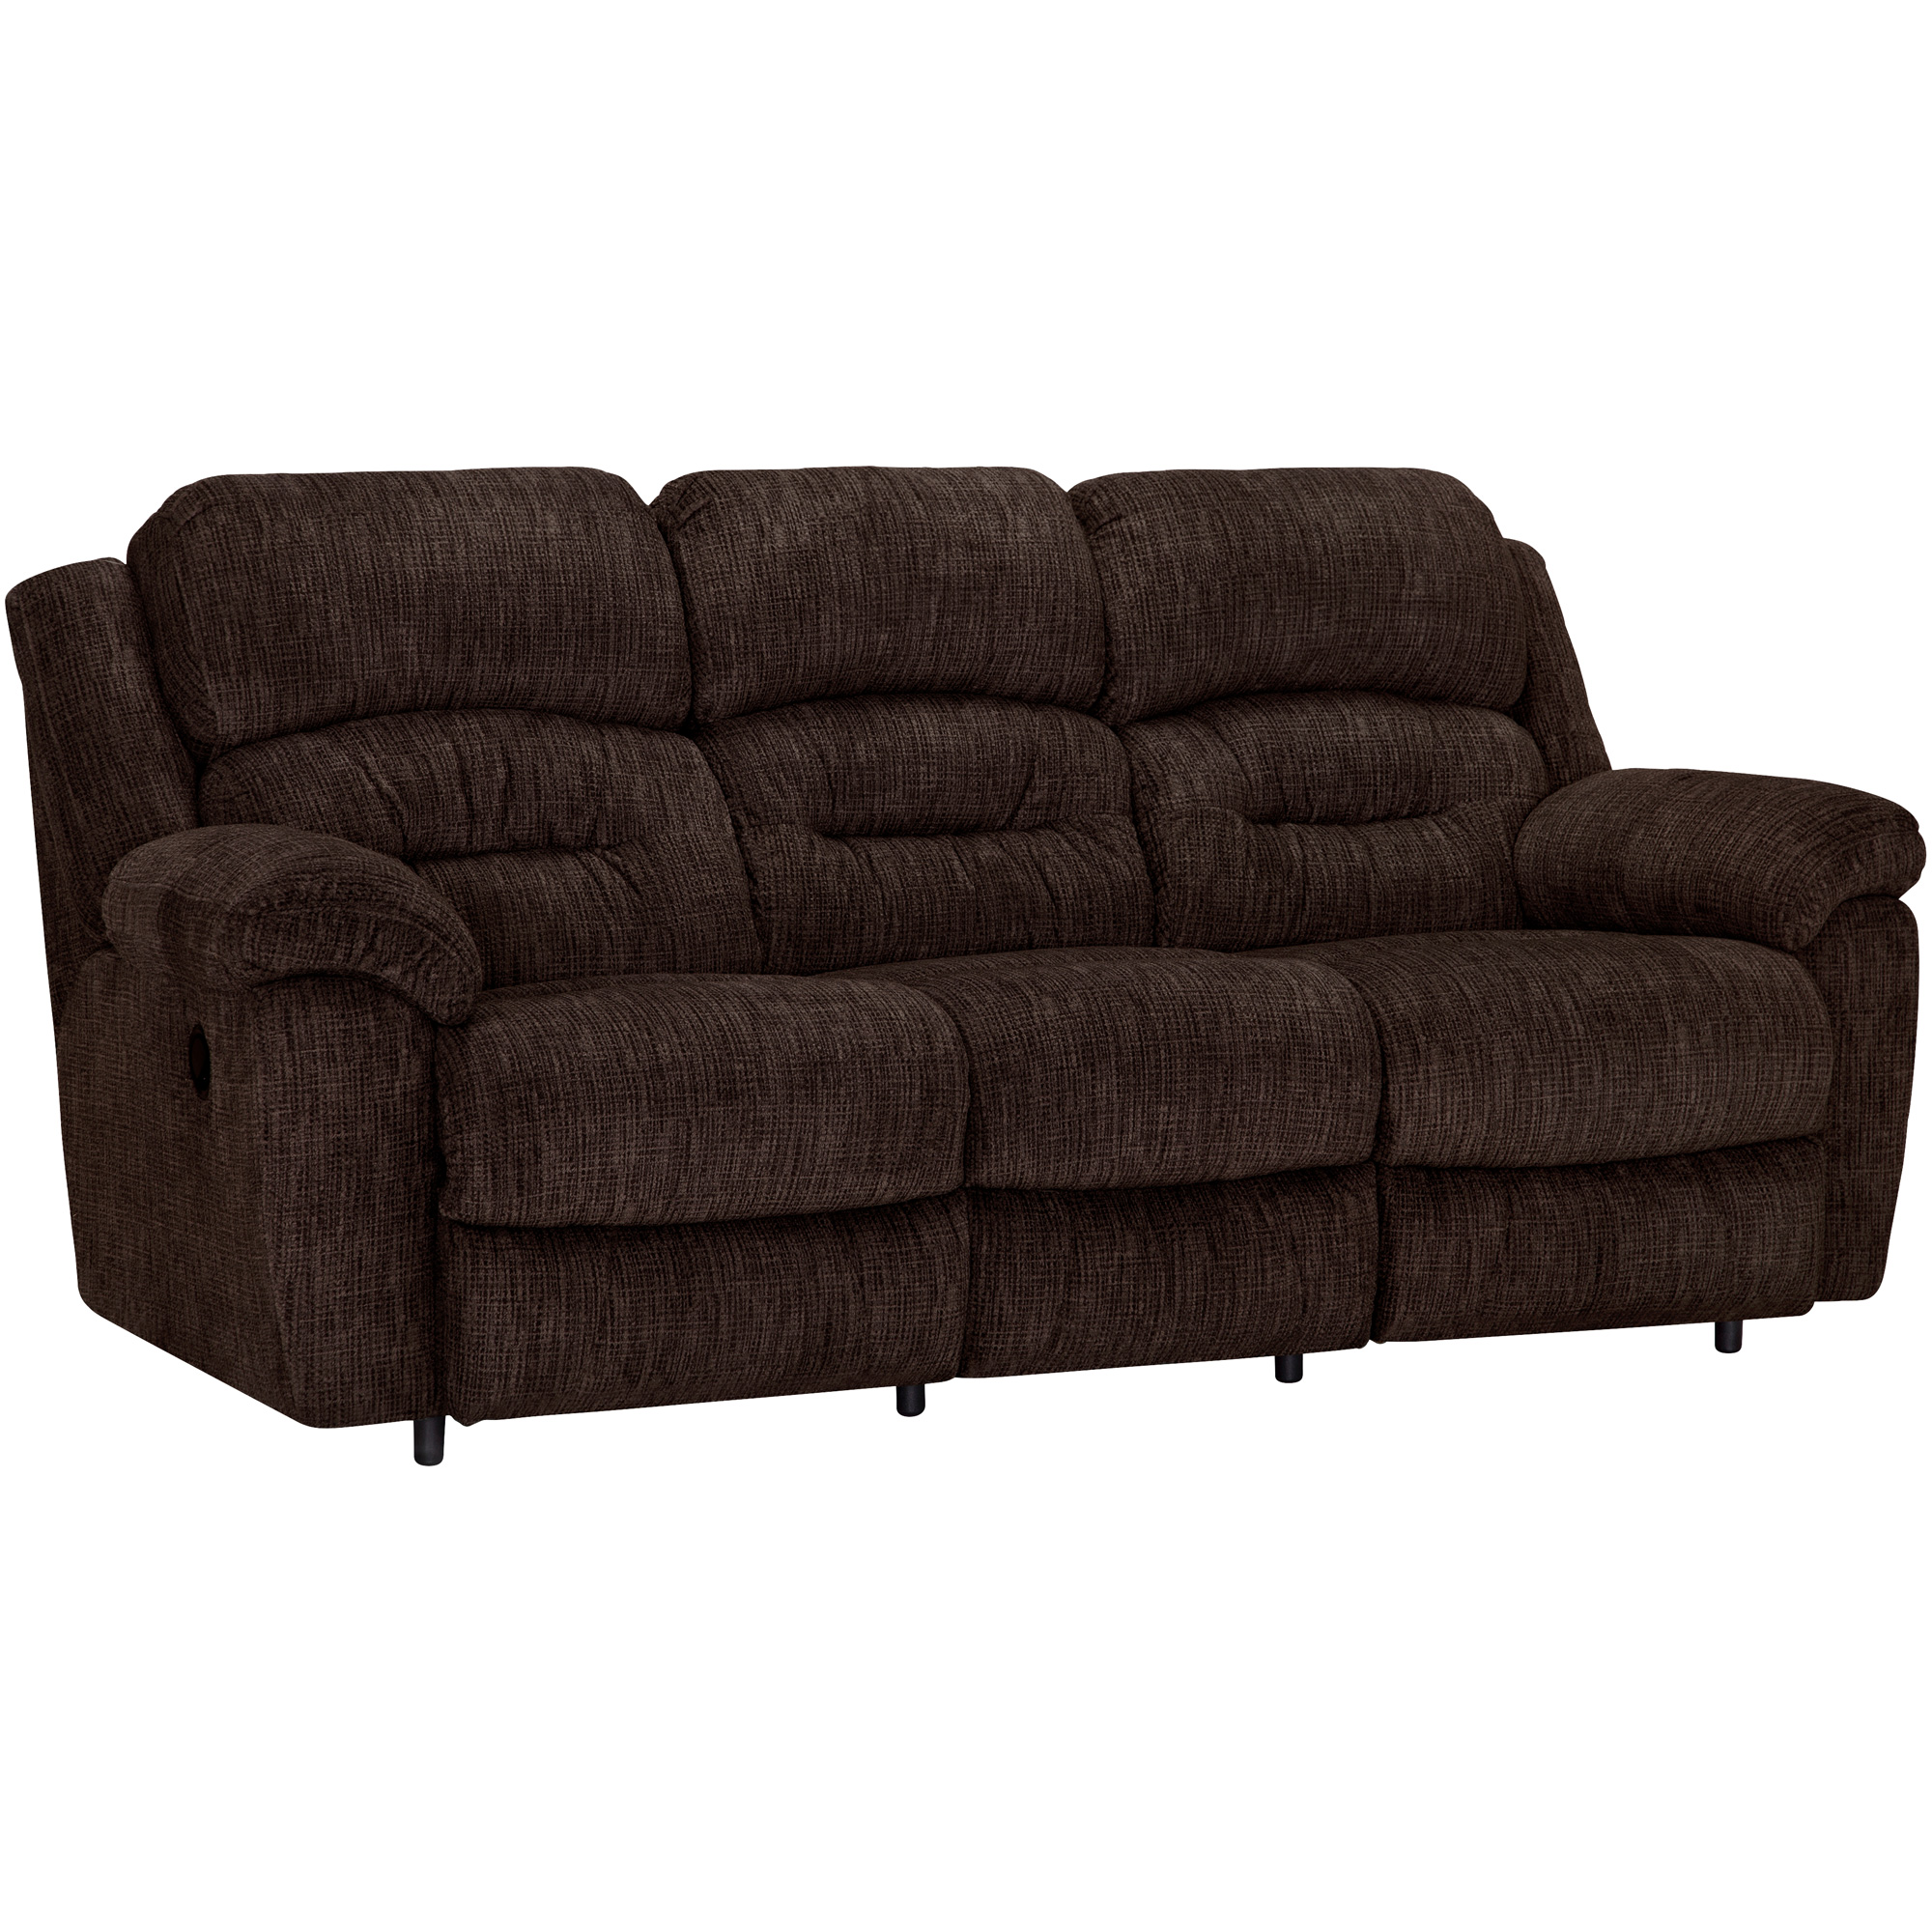 Franklin | Frontier Brown Reclining Sofa